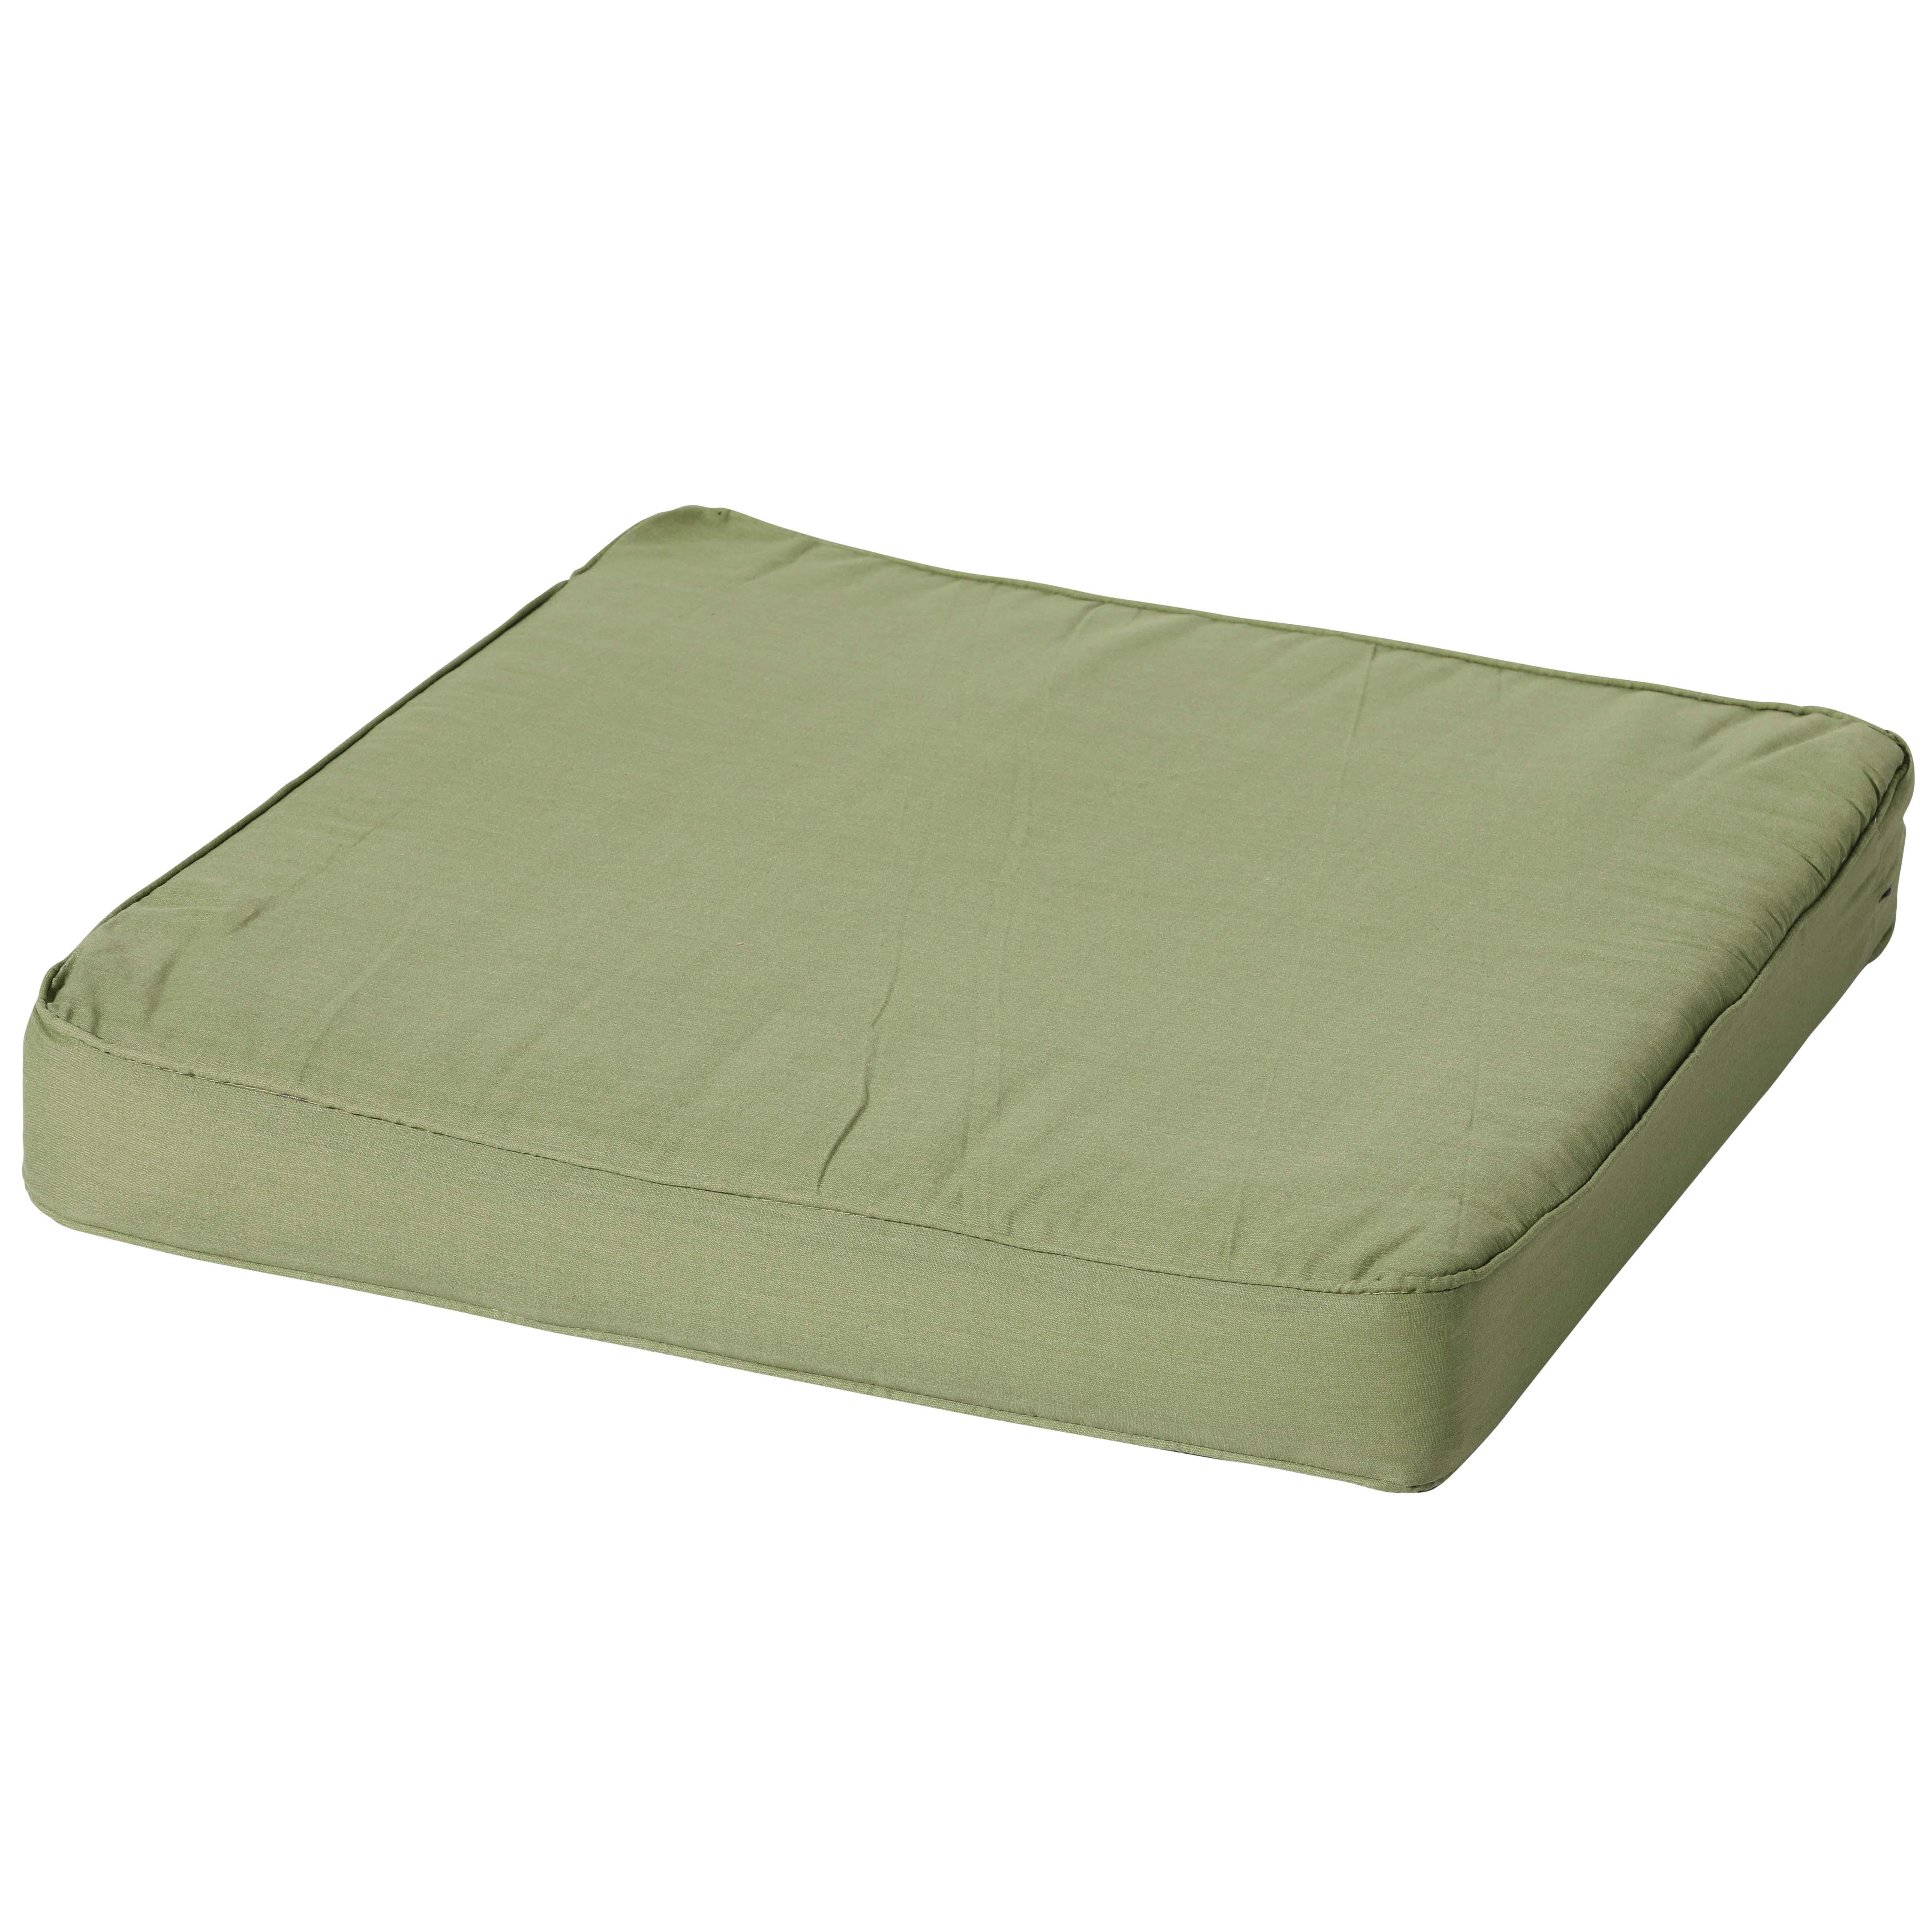 Loungekissen 60x60cm - Carre Basic grün